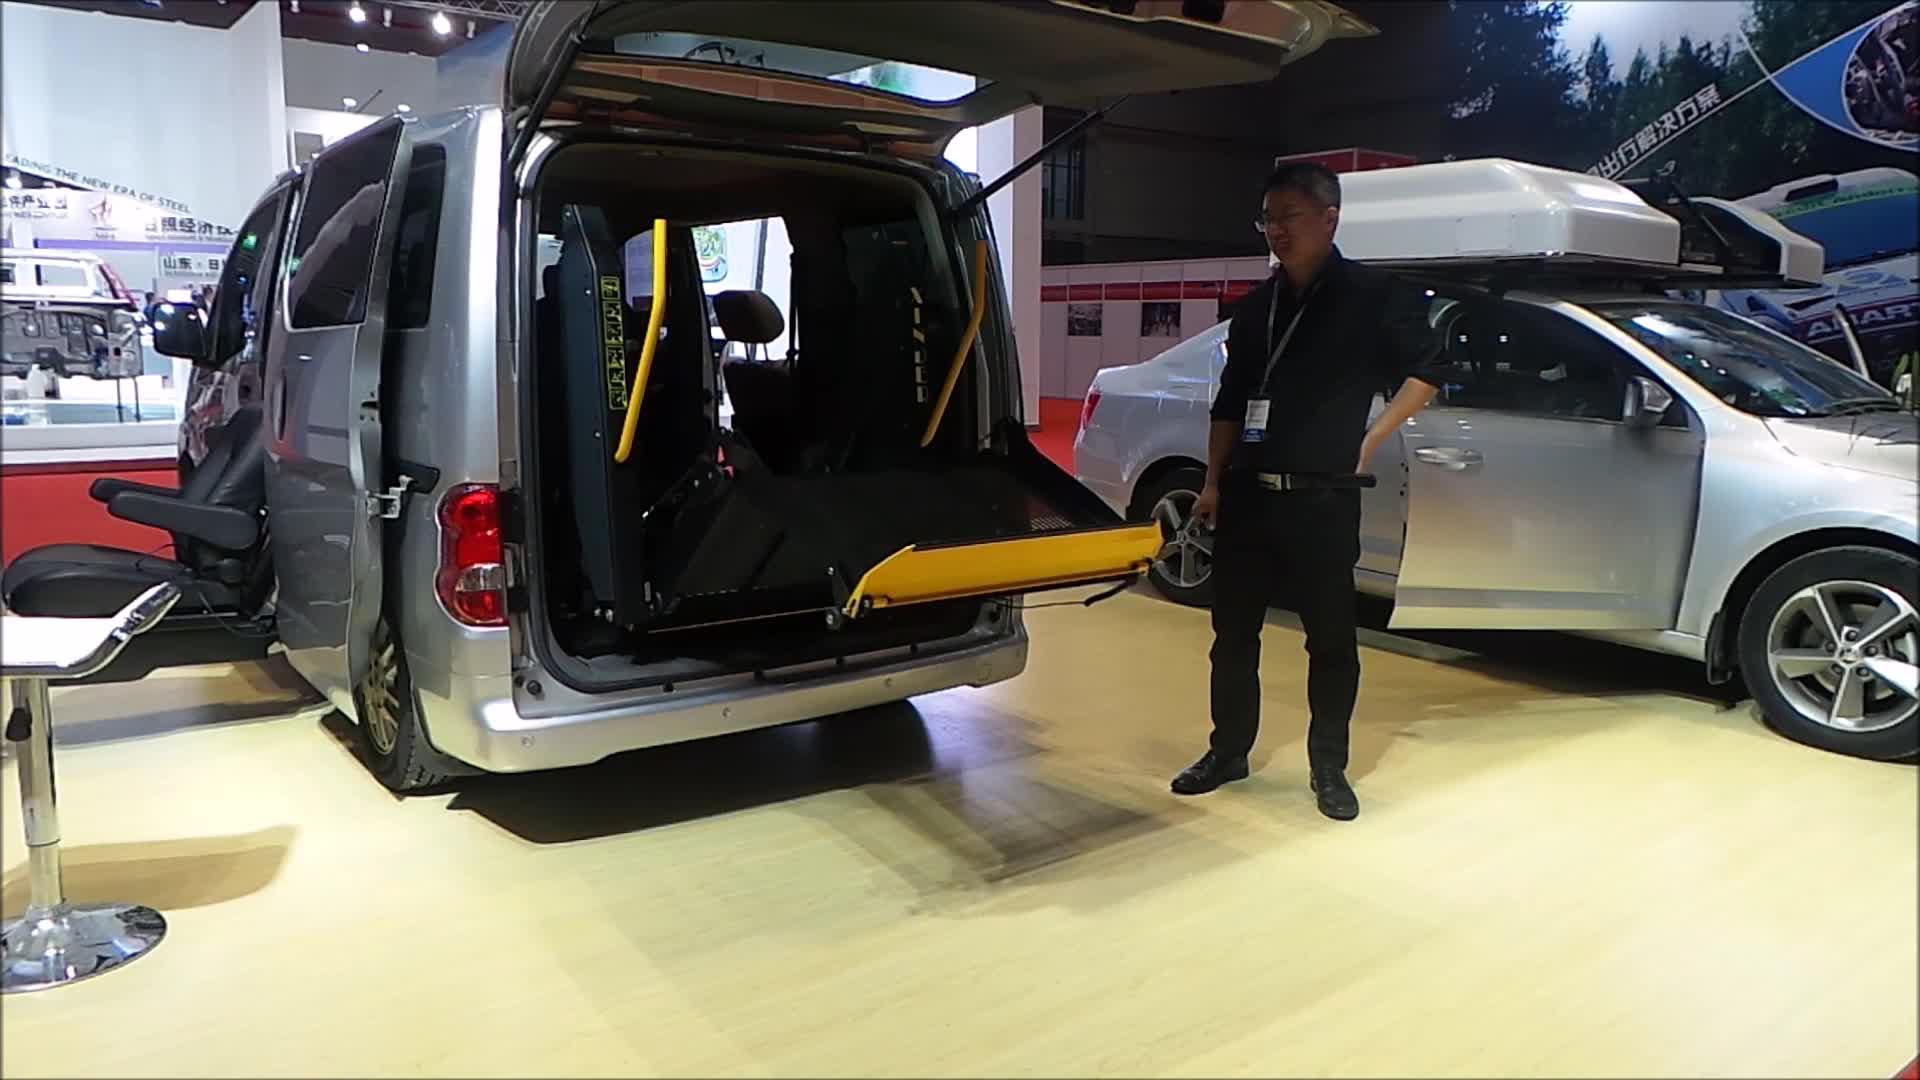 WL-D-880U Dual Arm Electric Wheelchair Lift for Van and Minivan